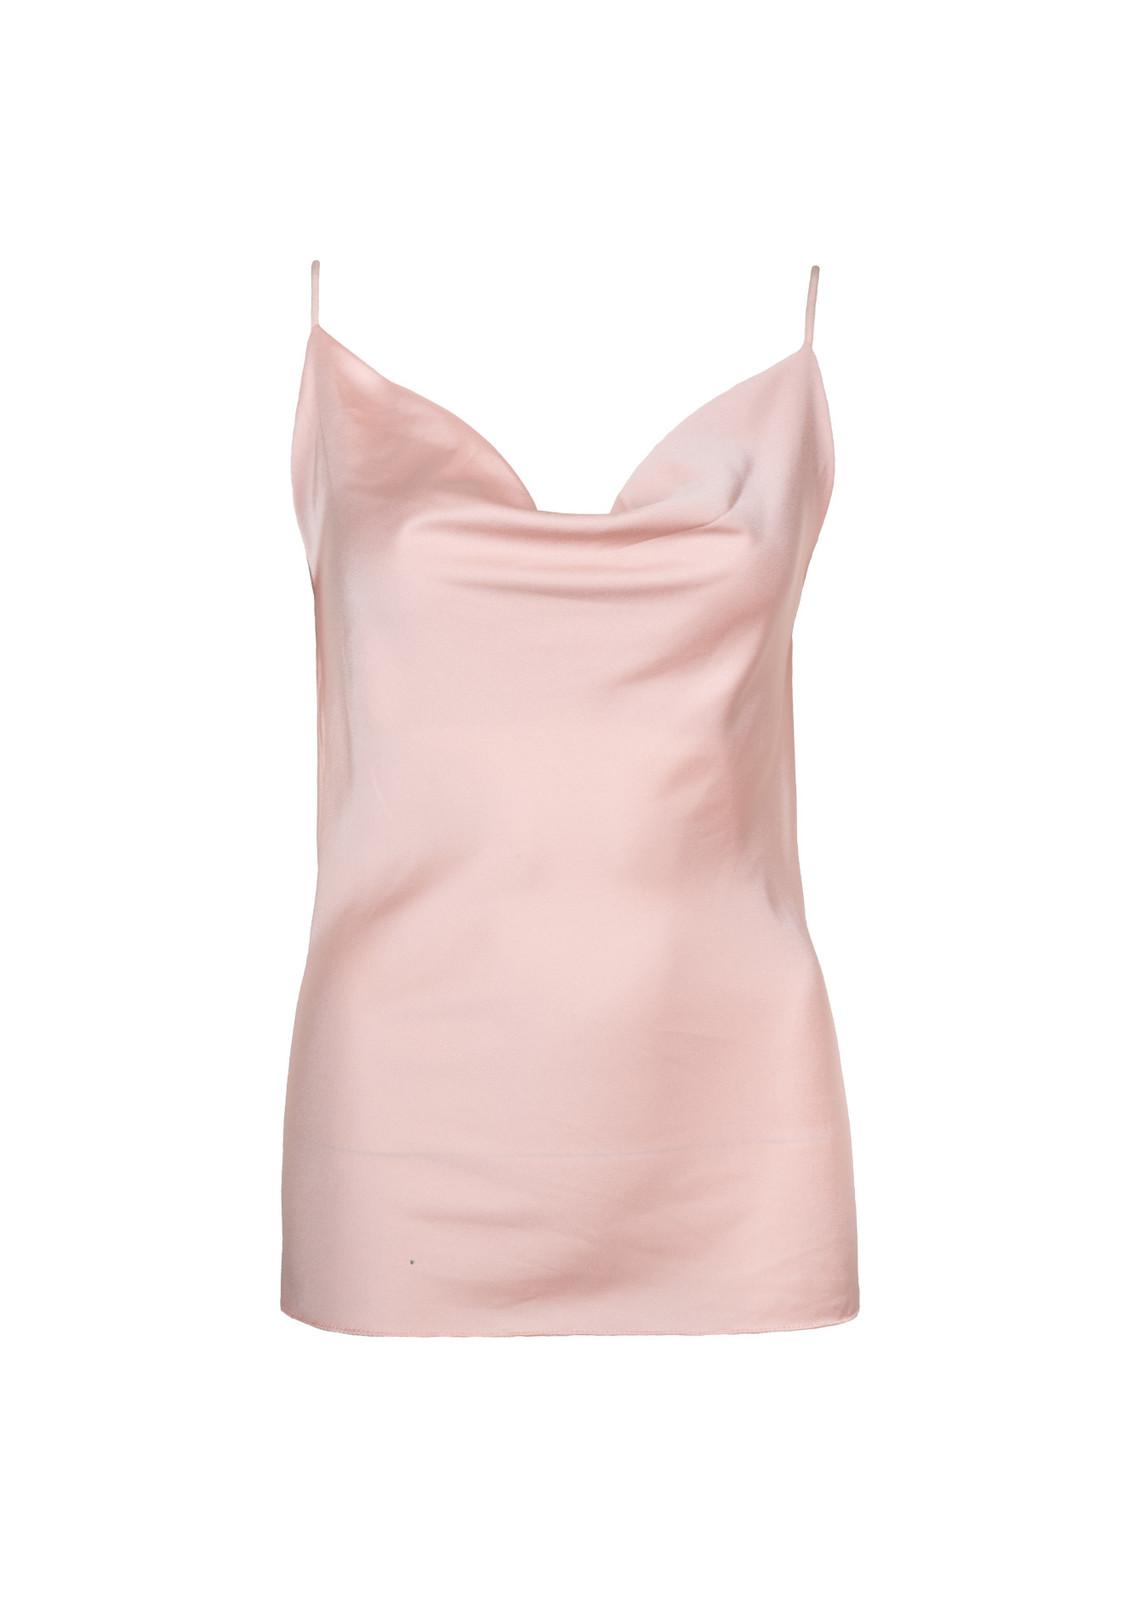 Satin top baby pink